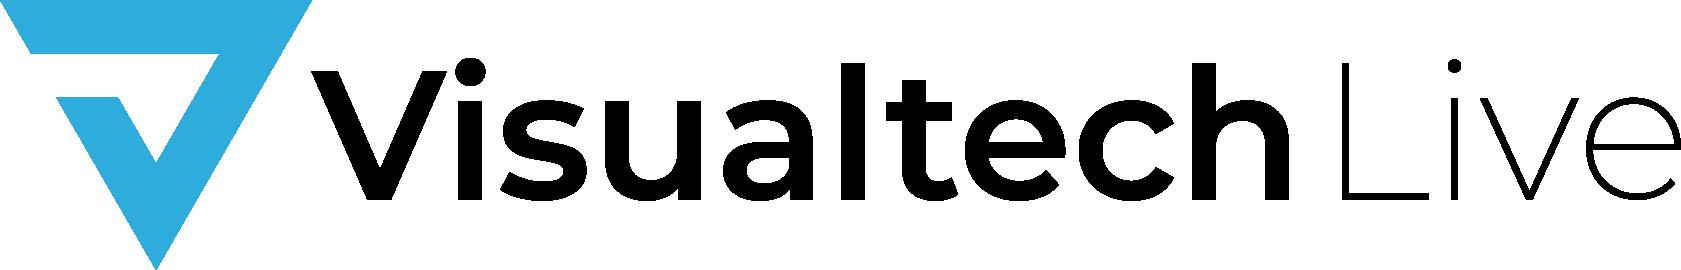 Visualtech Logo